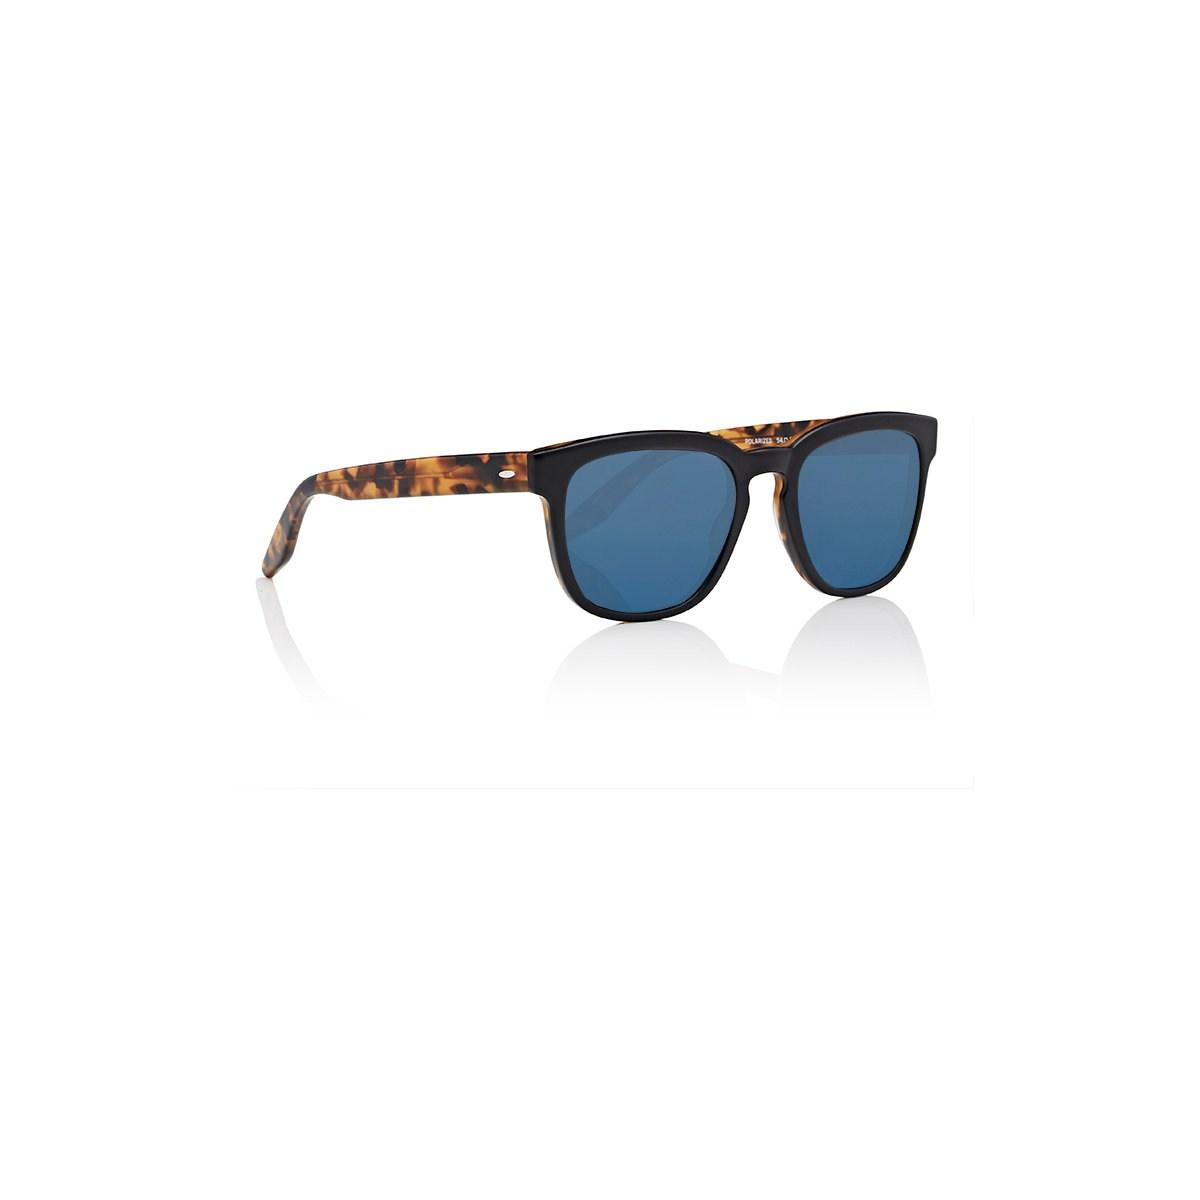 0d480f2fee0 Barton Perreira - Black Coltrane Sunglasses for Men - Lyst. View fullscreen